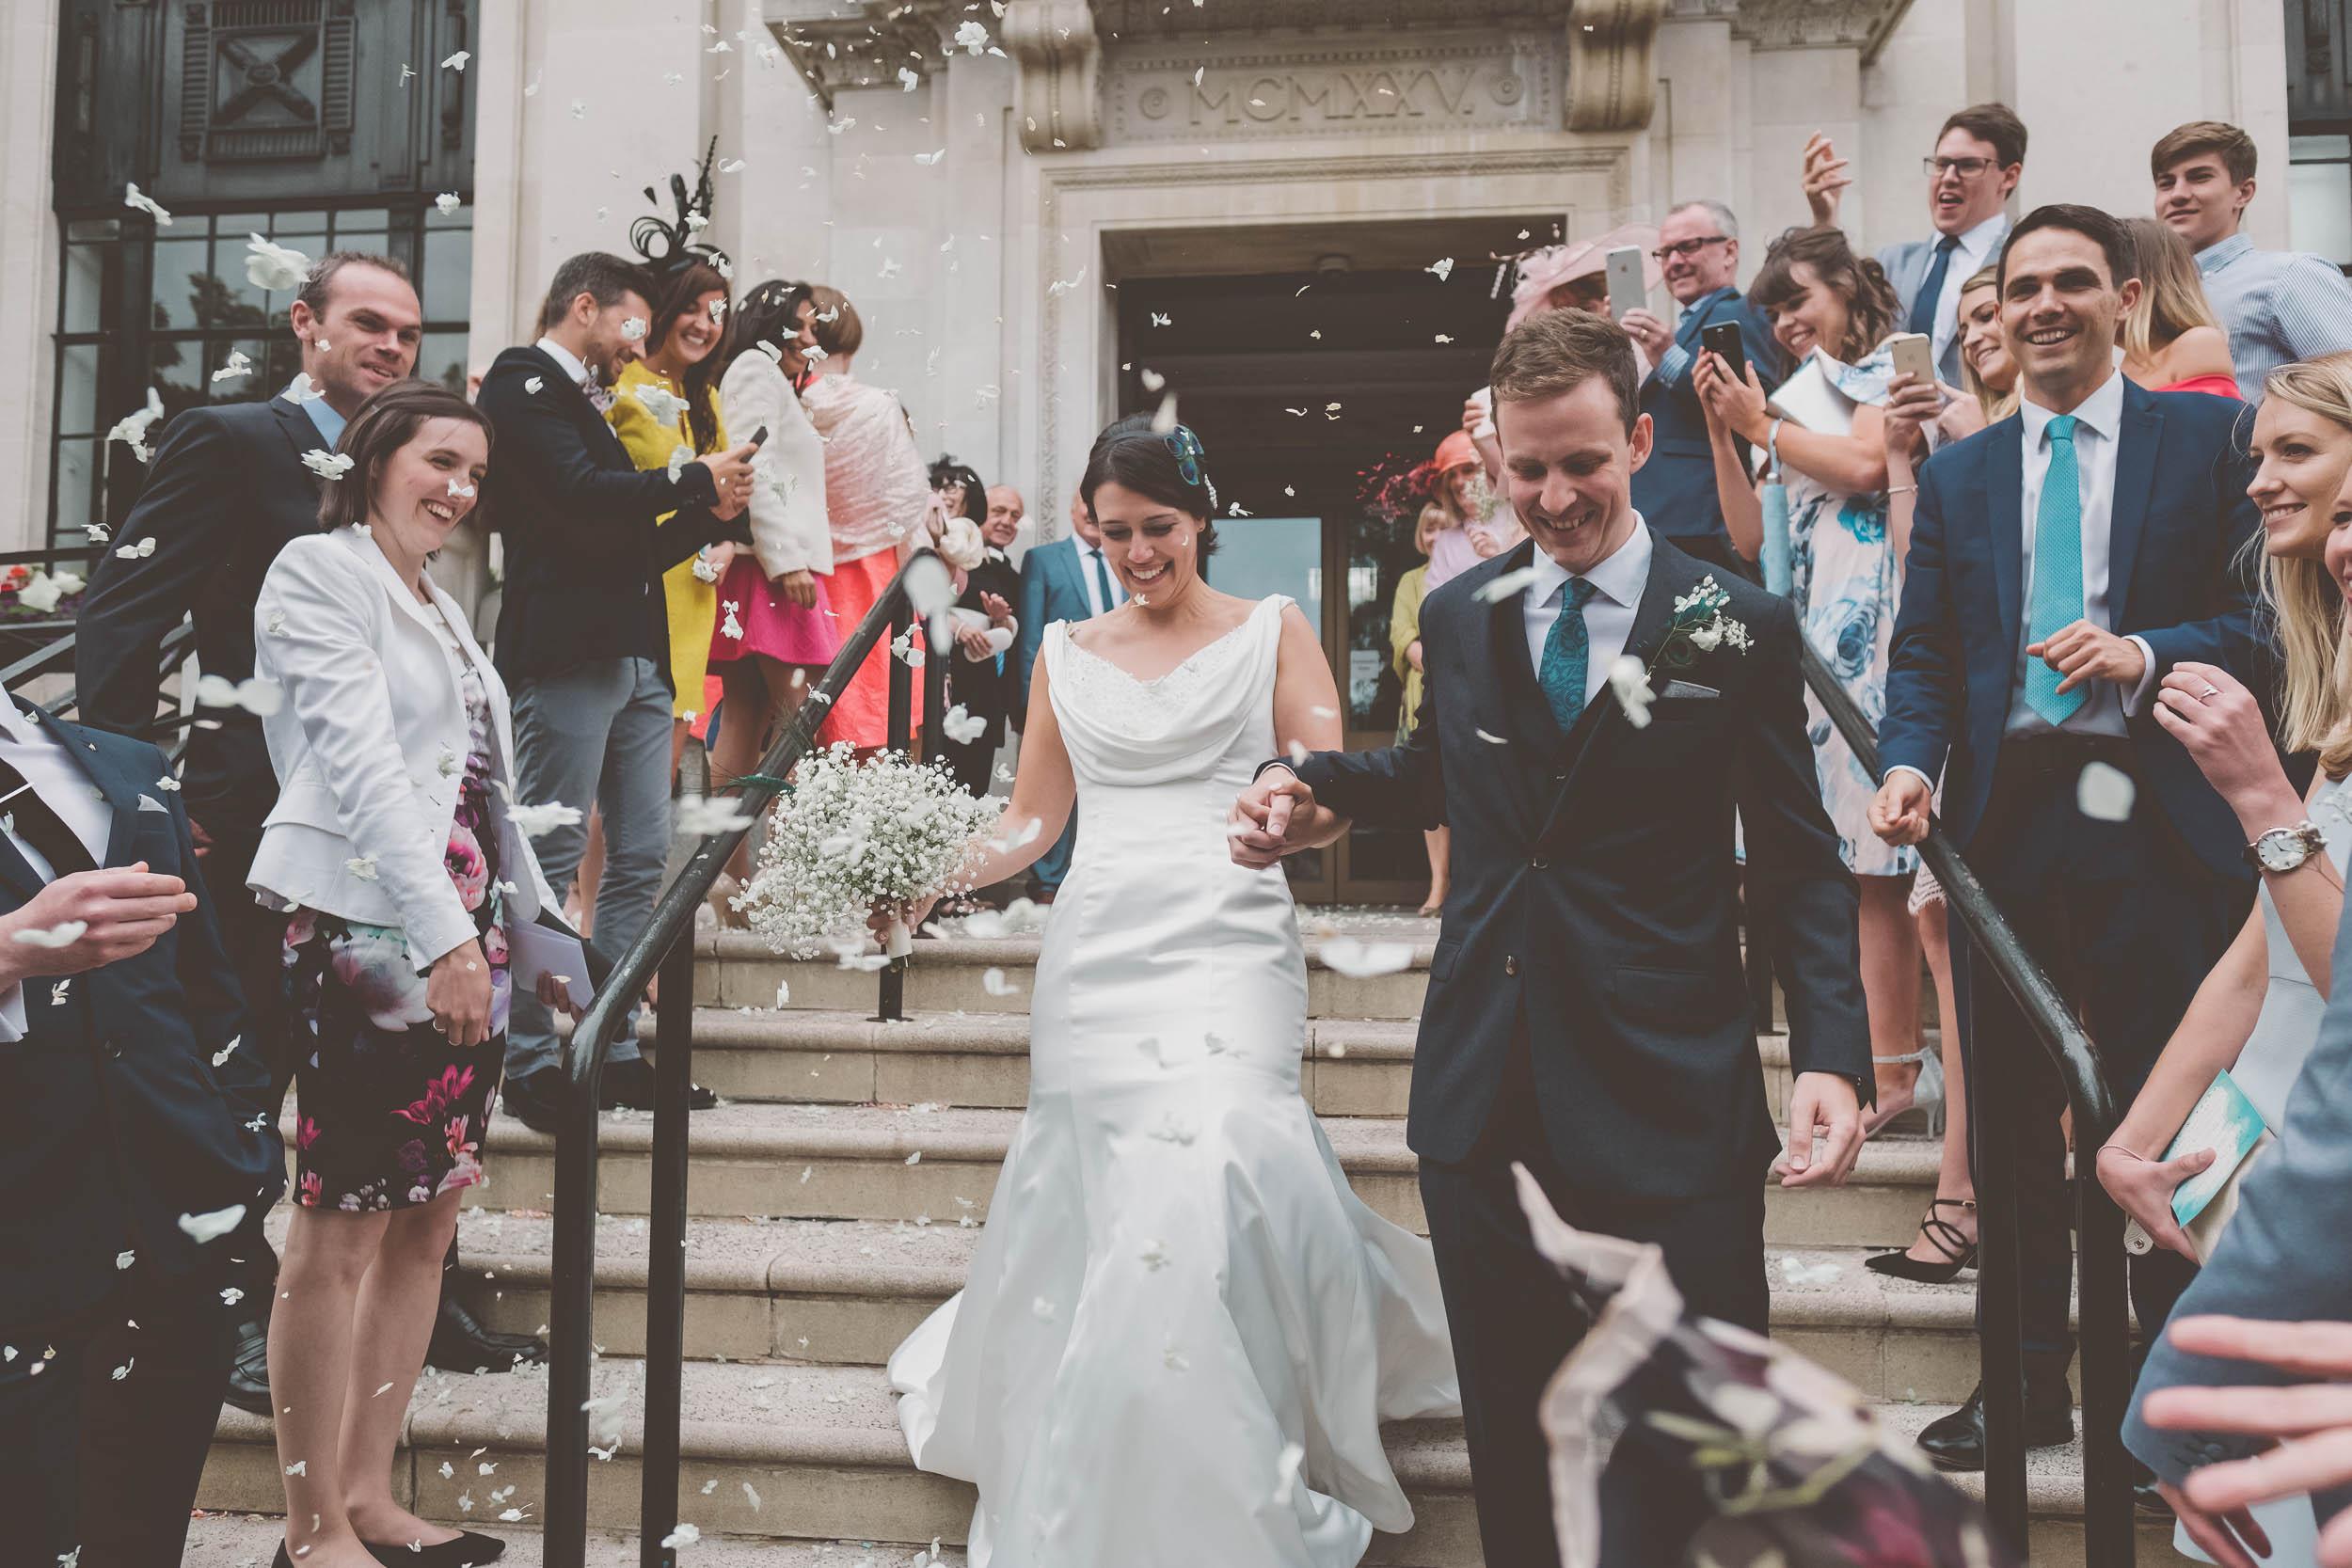 islington-town-hall-4th-floor-studios-wedding155.jpg